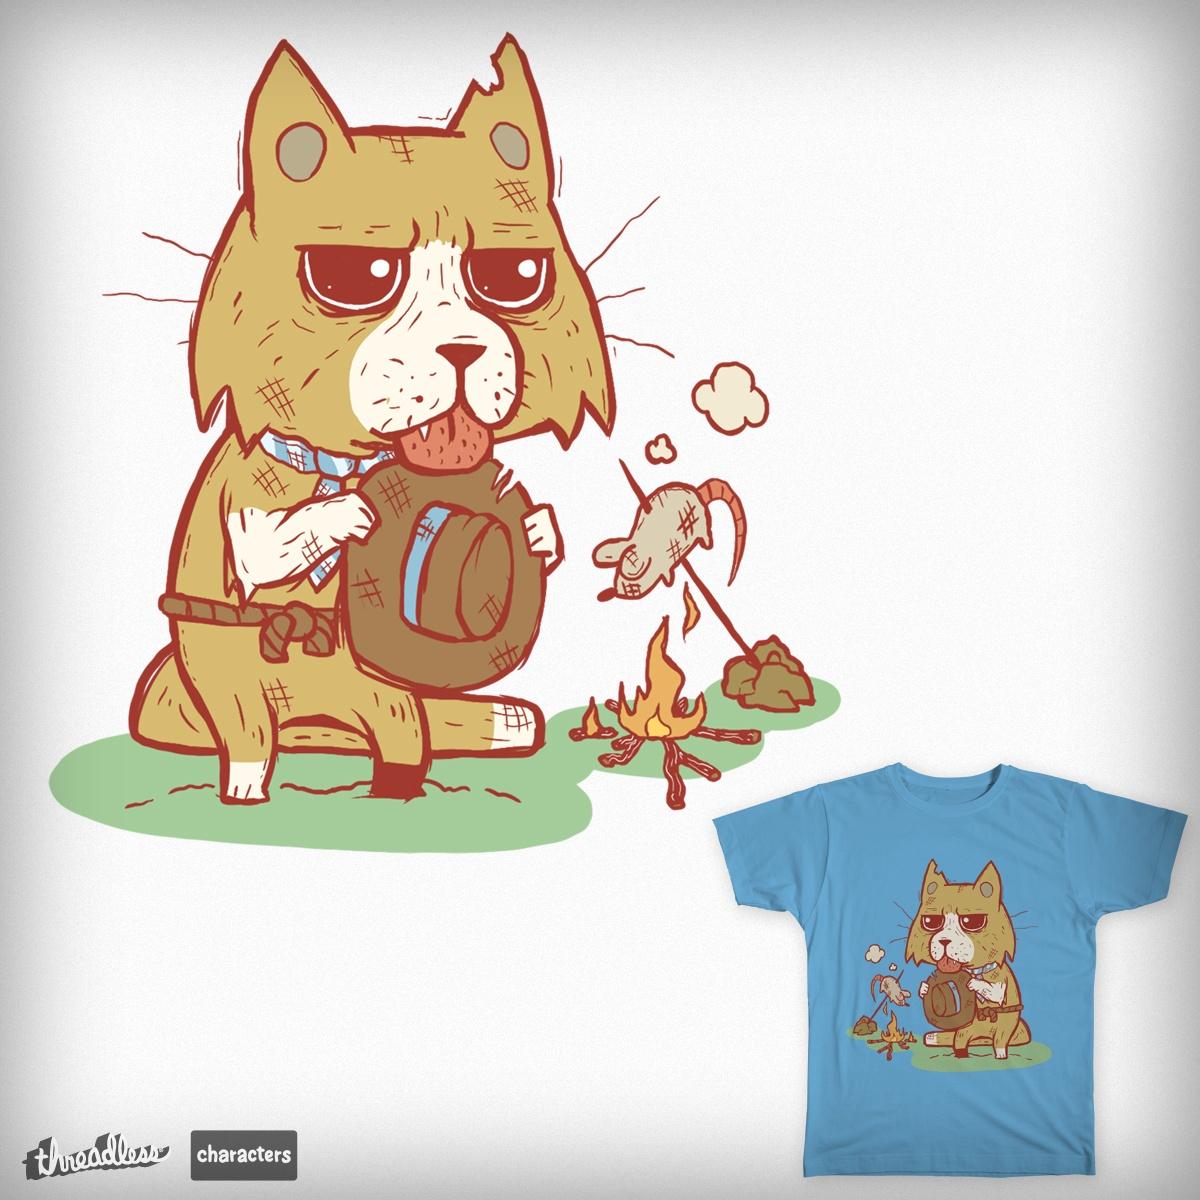 Hobo cat by Buguwa on Threadless